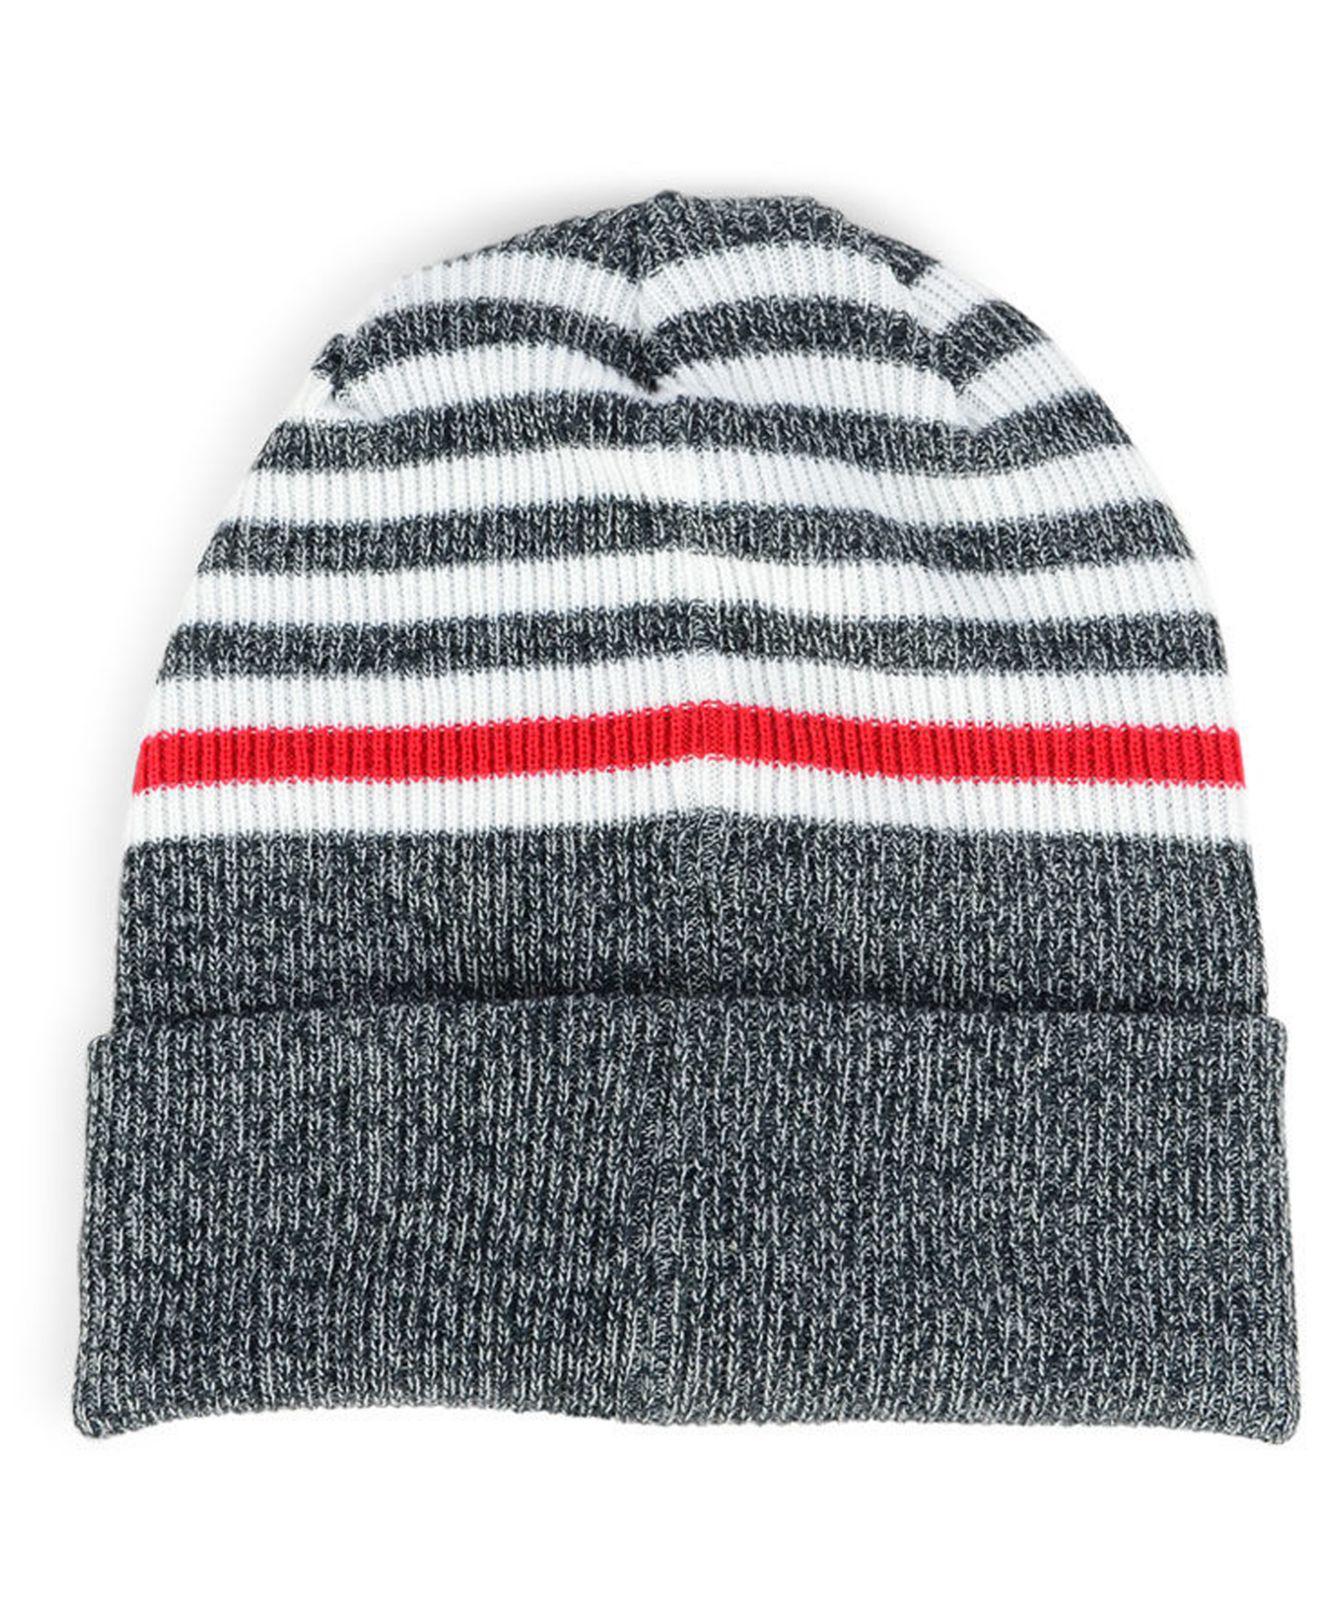 ad9ad170d reduced minnesota twins new era zubaz reversible knit beanie. item image  824c5 652d3; cheapest lyst ktz minnesota twins striped cuff knit hat in  blue for ...